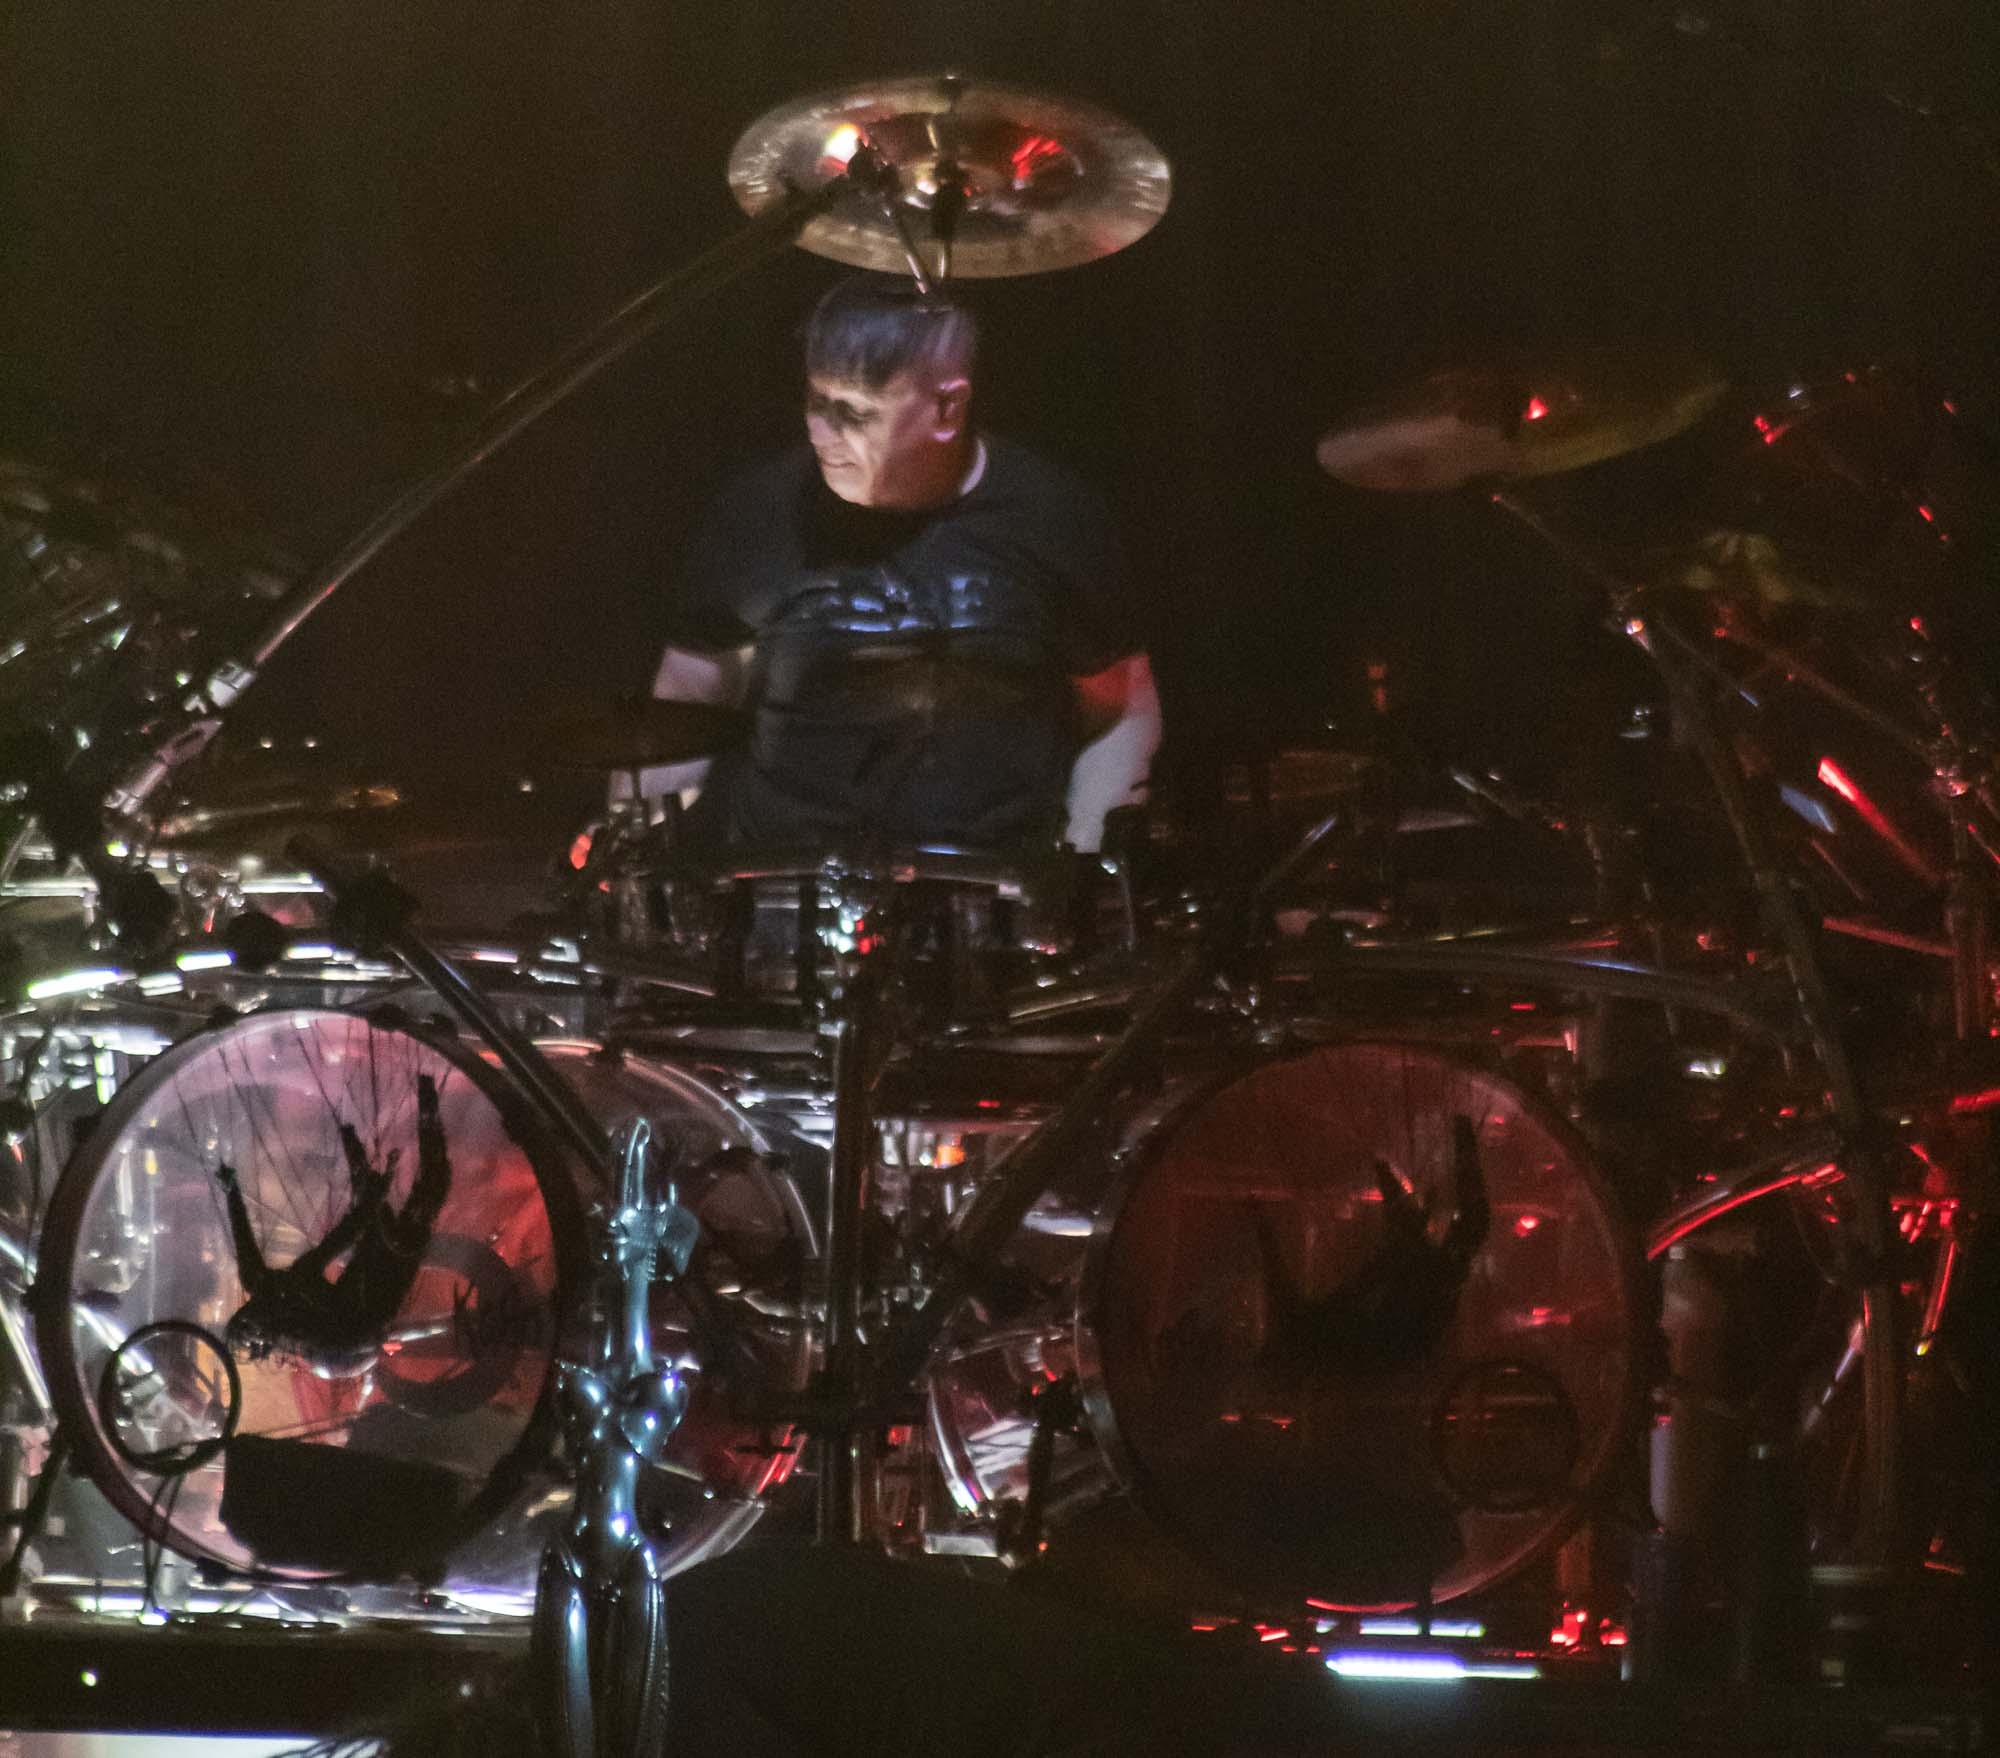 Korn-BudweiserStage-Toronto_Ontario-20190814-JeremyGretzinger8